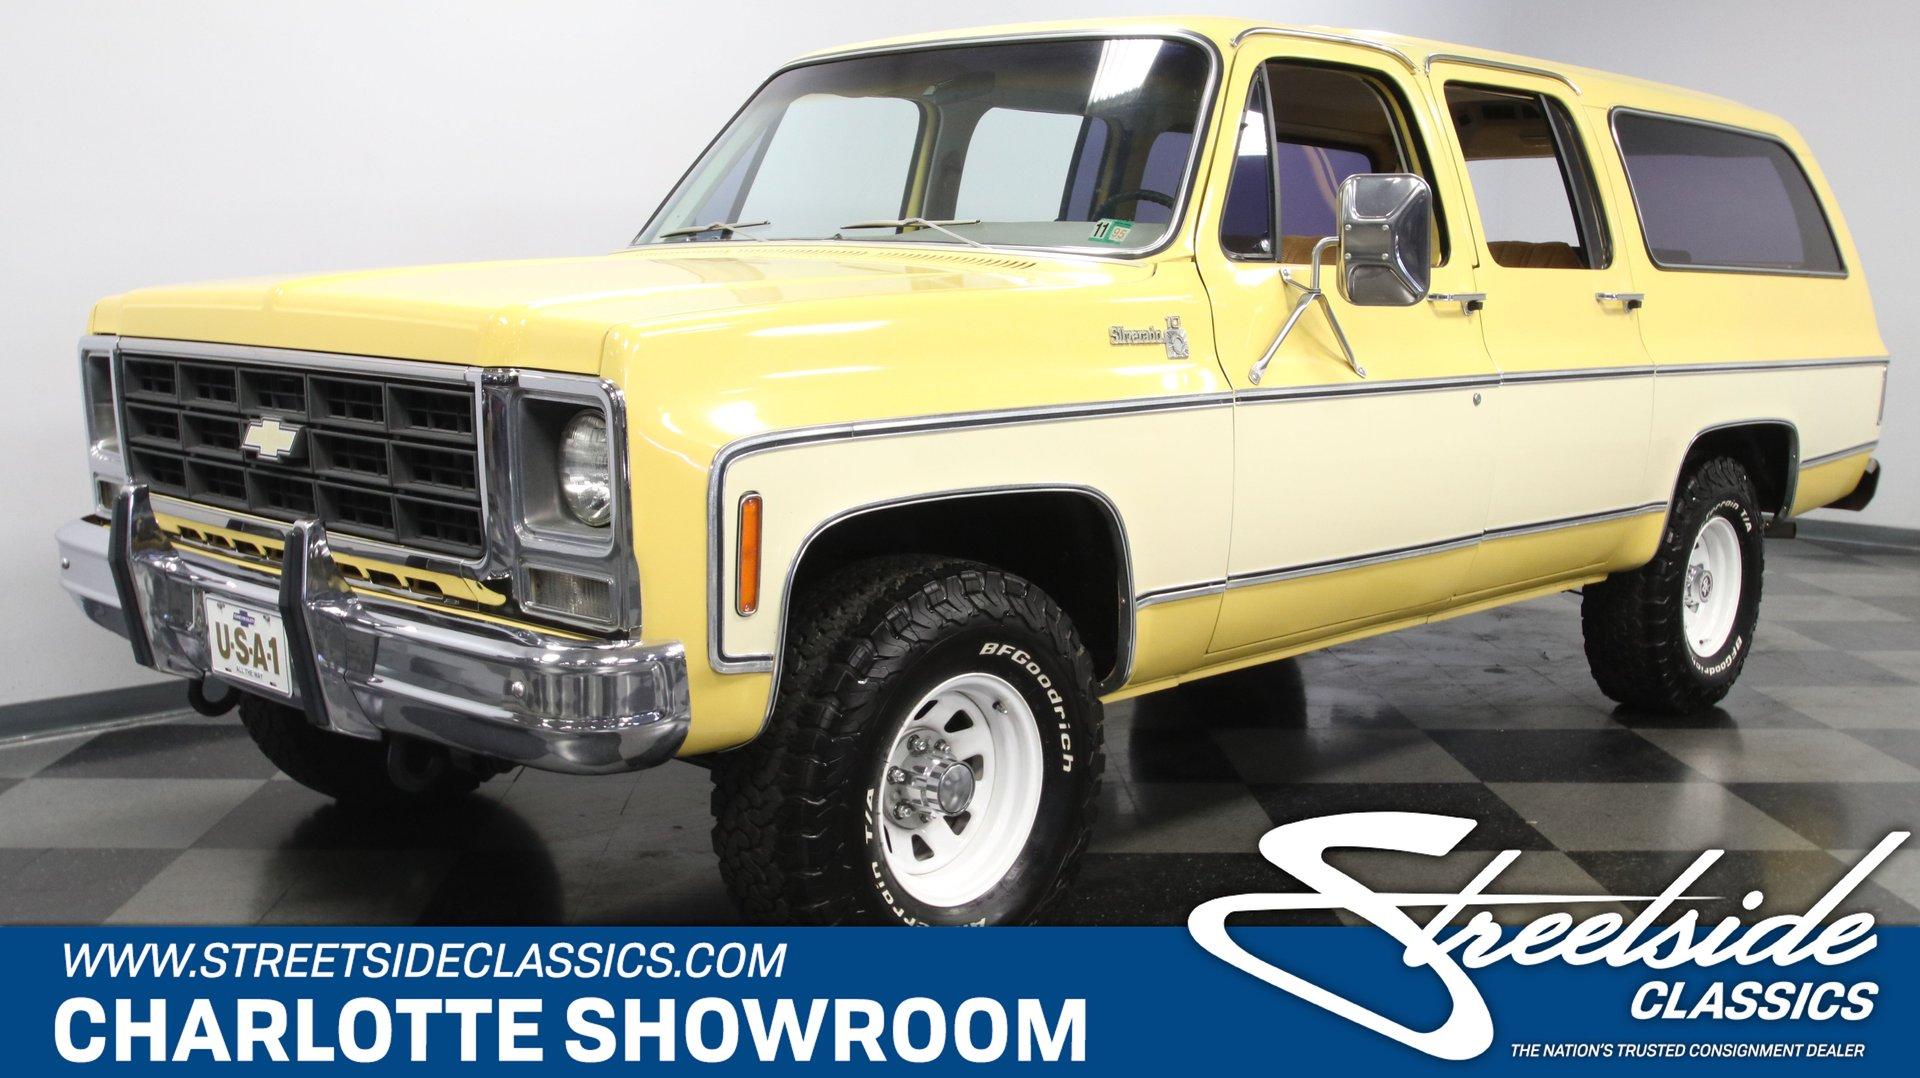 1979 chevrolet suburban 4x4 trailering special